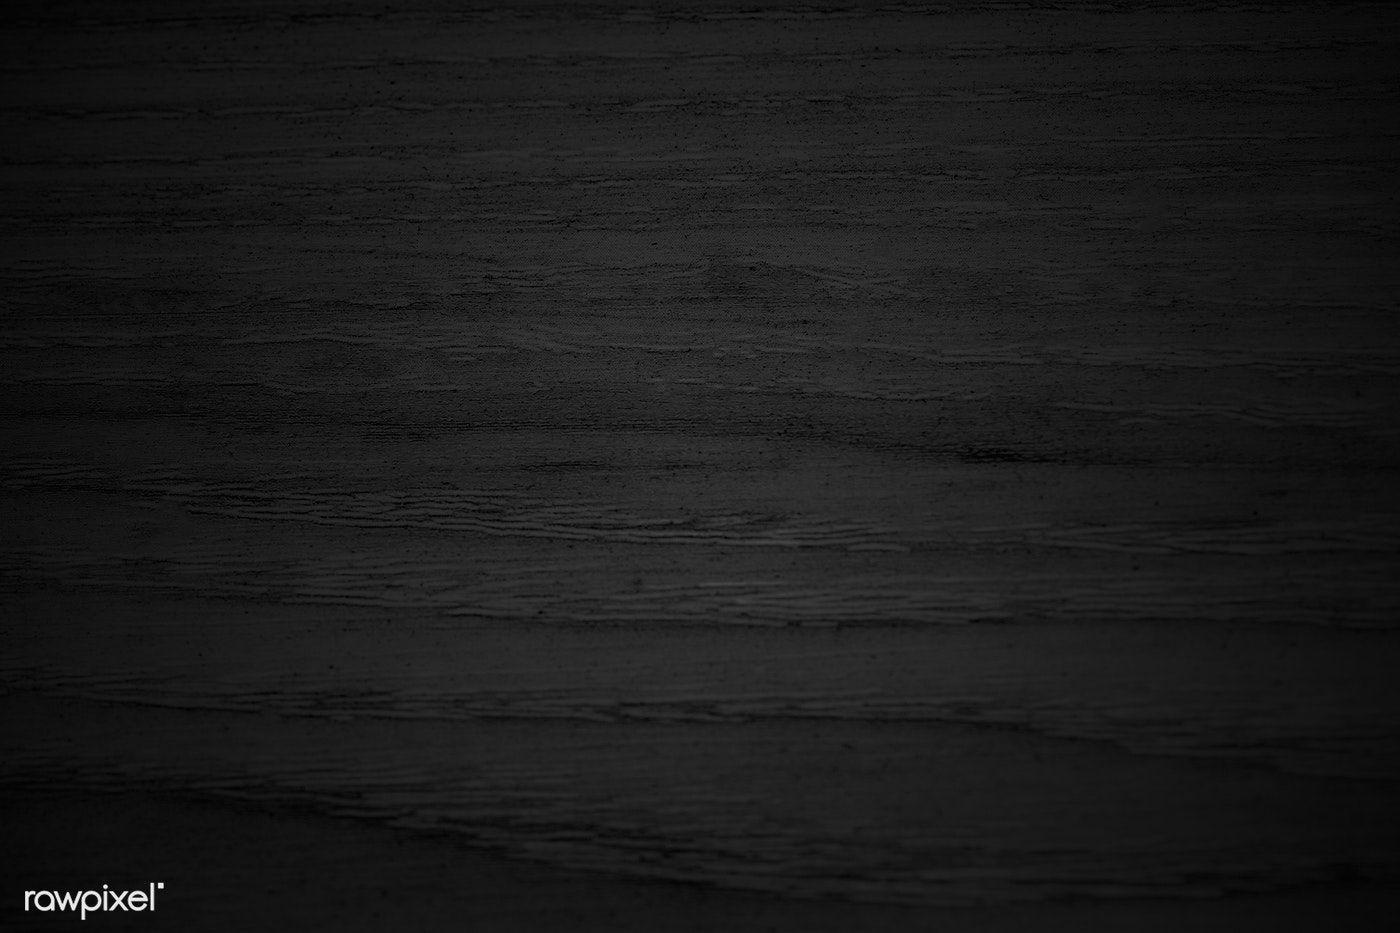 Dark Gray Wooden Textured Flooring Background Free Image By